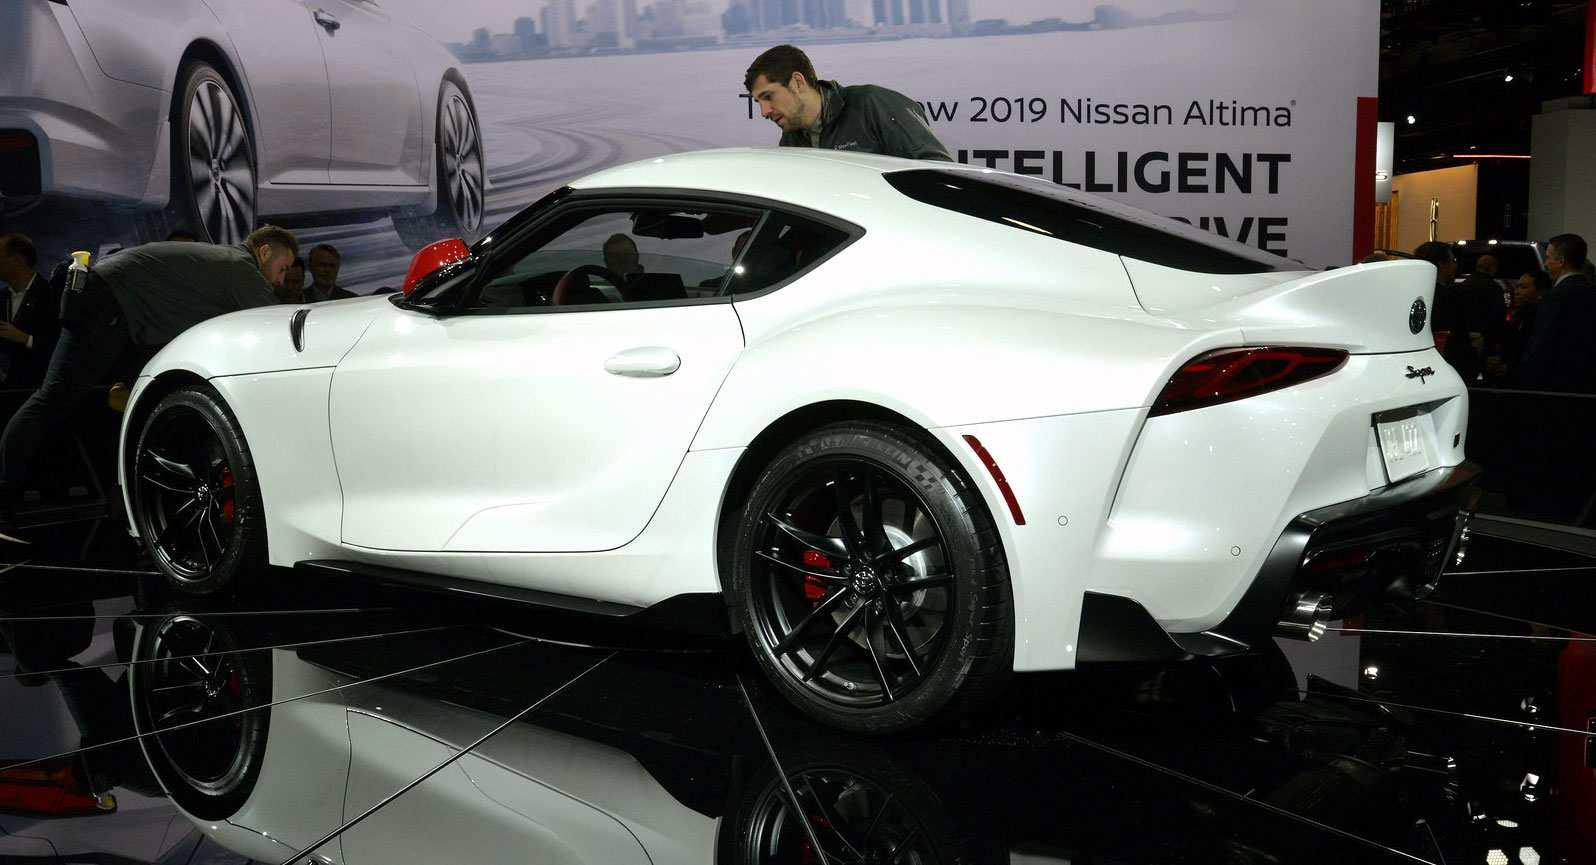 42 Concept of Toyota Gr Supra 2020 Rumors for Toyota Gr Supra 2020